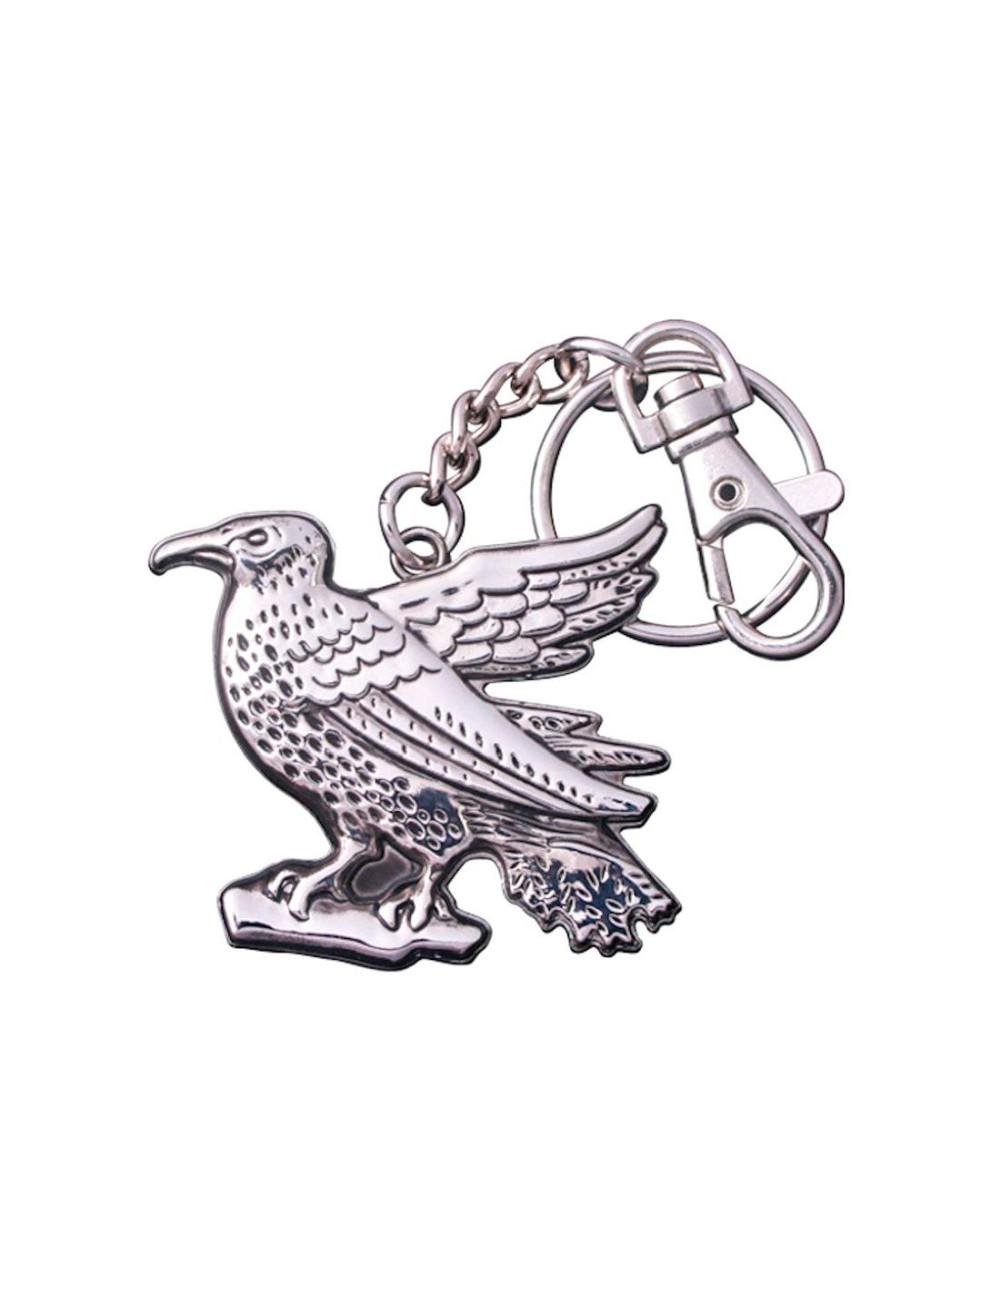 Harry Potter - Ravenclaw - Metall Schlüsselanhänger